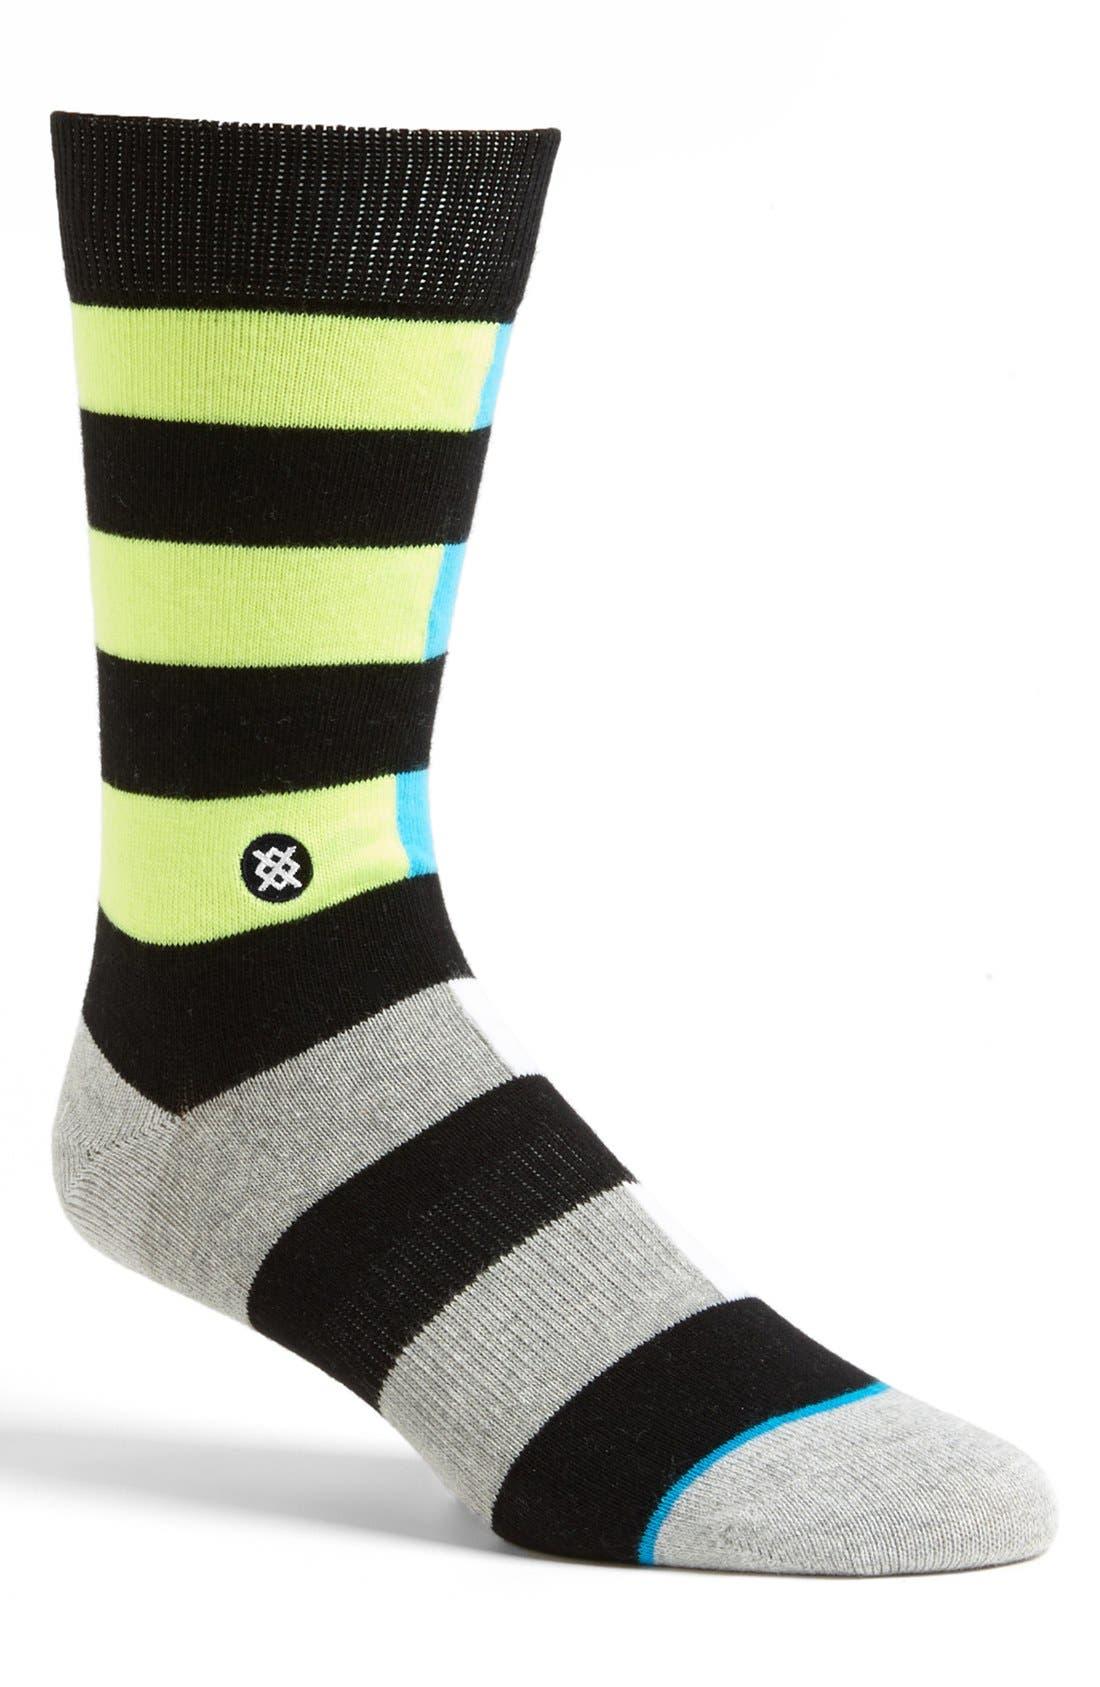 Alternate Image 1 Selected - Stance 'Mason' Socks